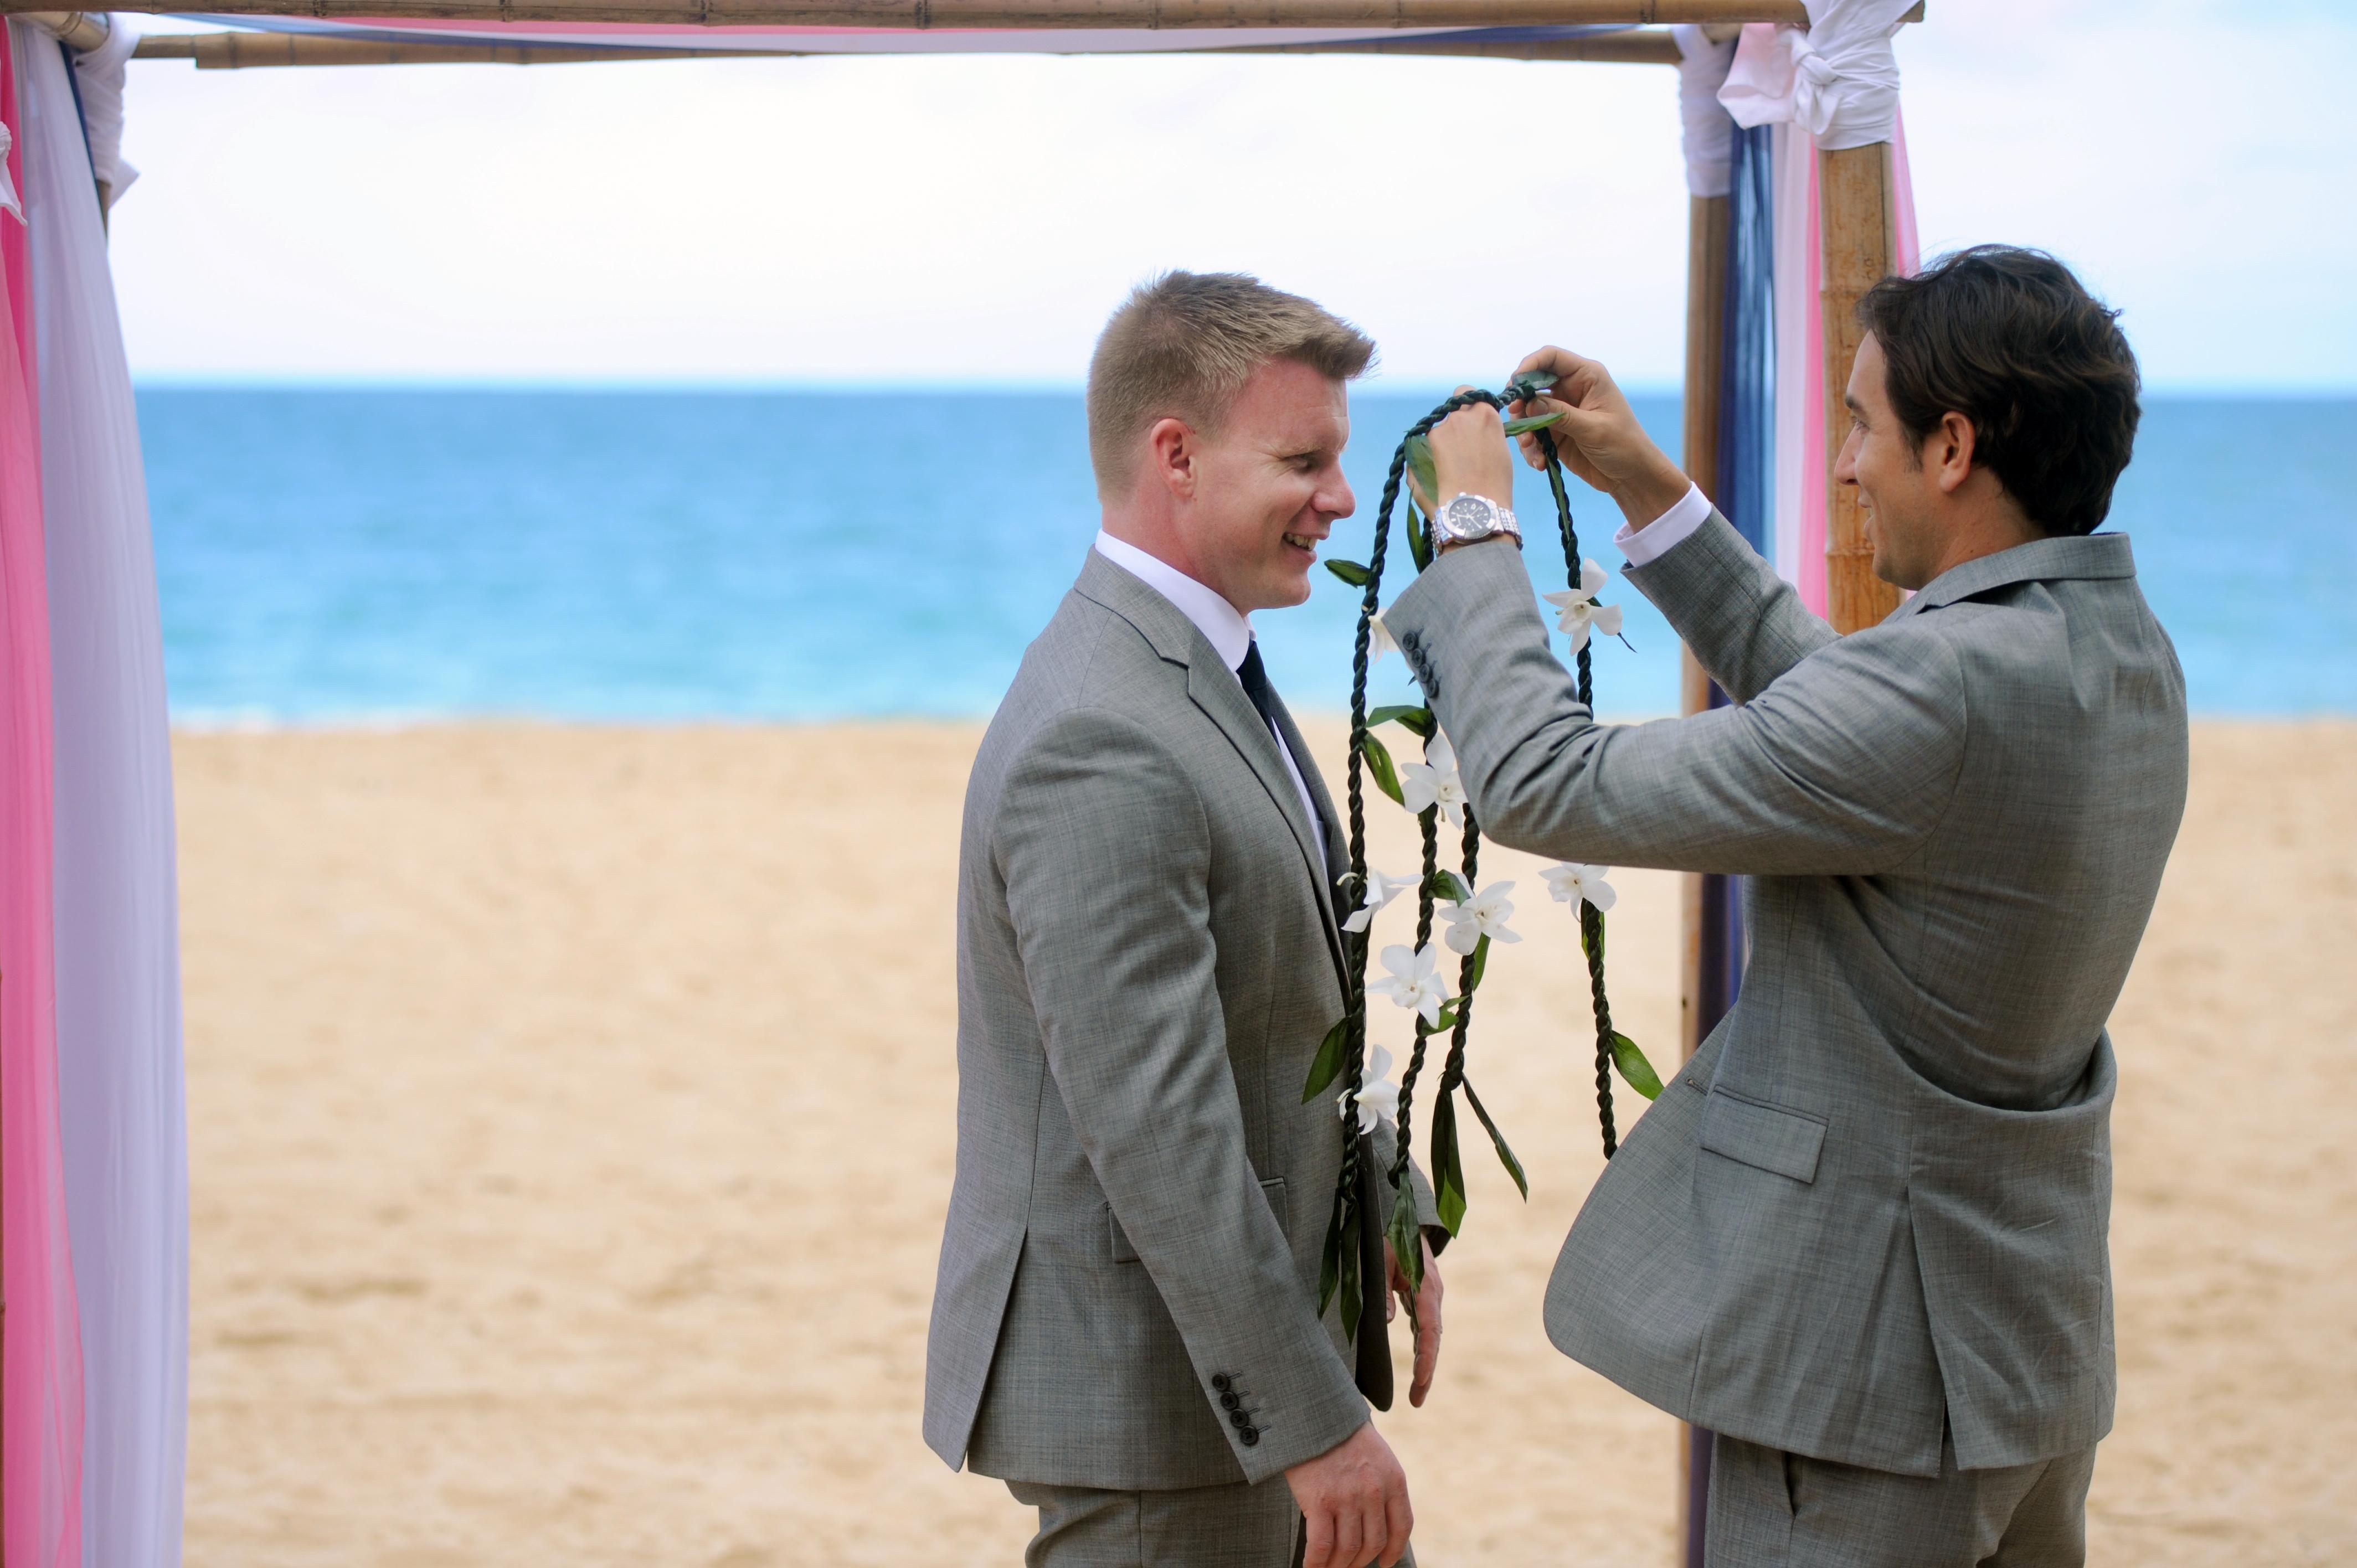 wedding In Hawaii - wedding ceremony-8